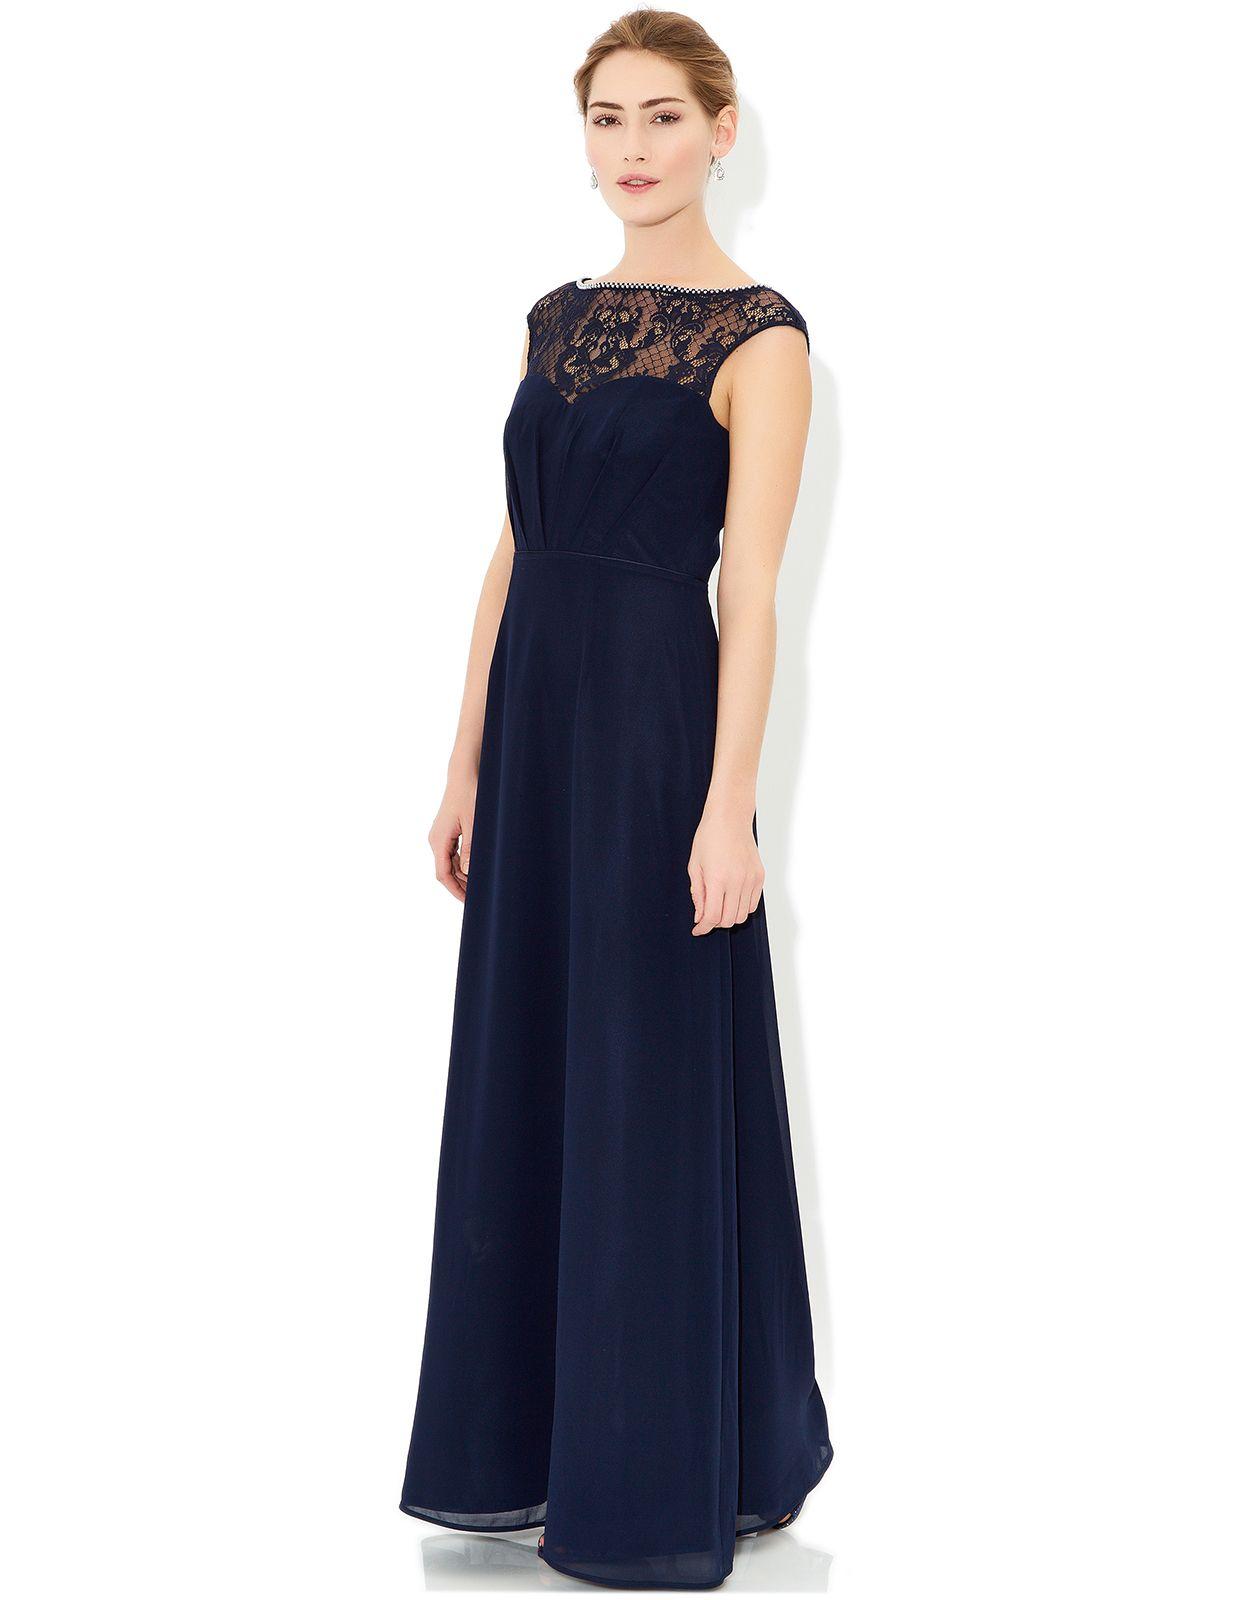 Maisie maxi dress navy monsoon 210 dresses pinterest maxi maisie maxi dress navy monsoon 210 ombrellifo Choice Image